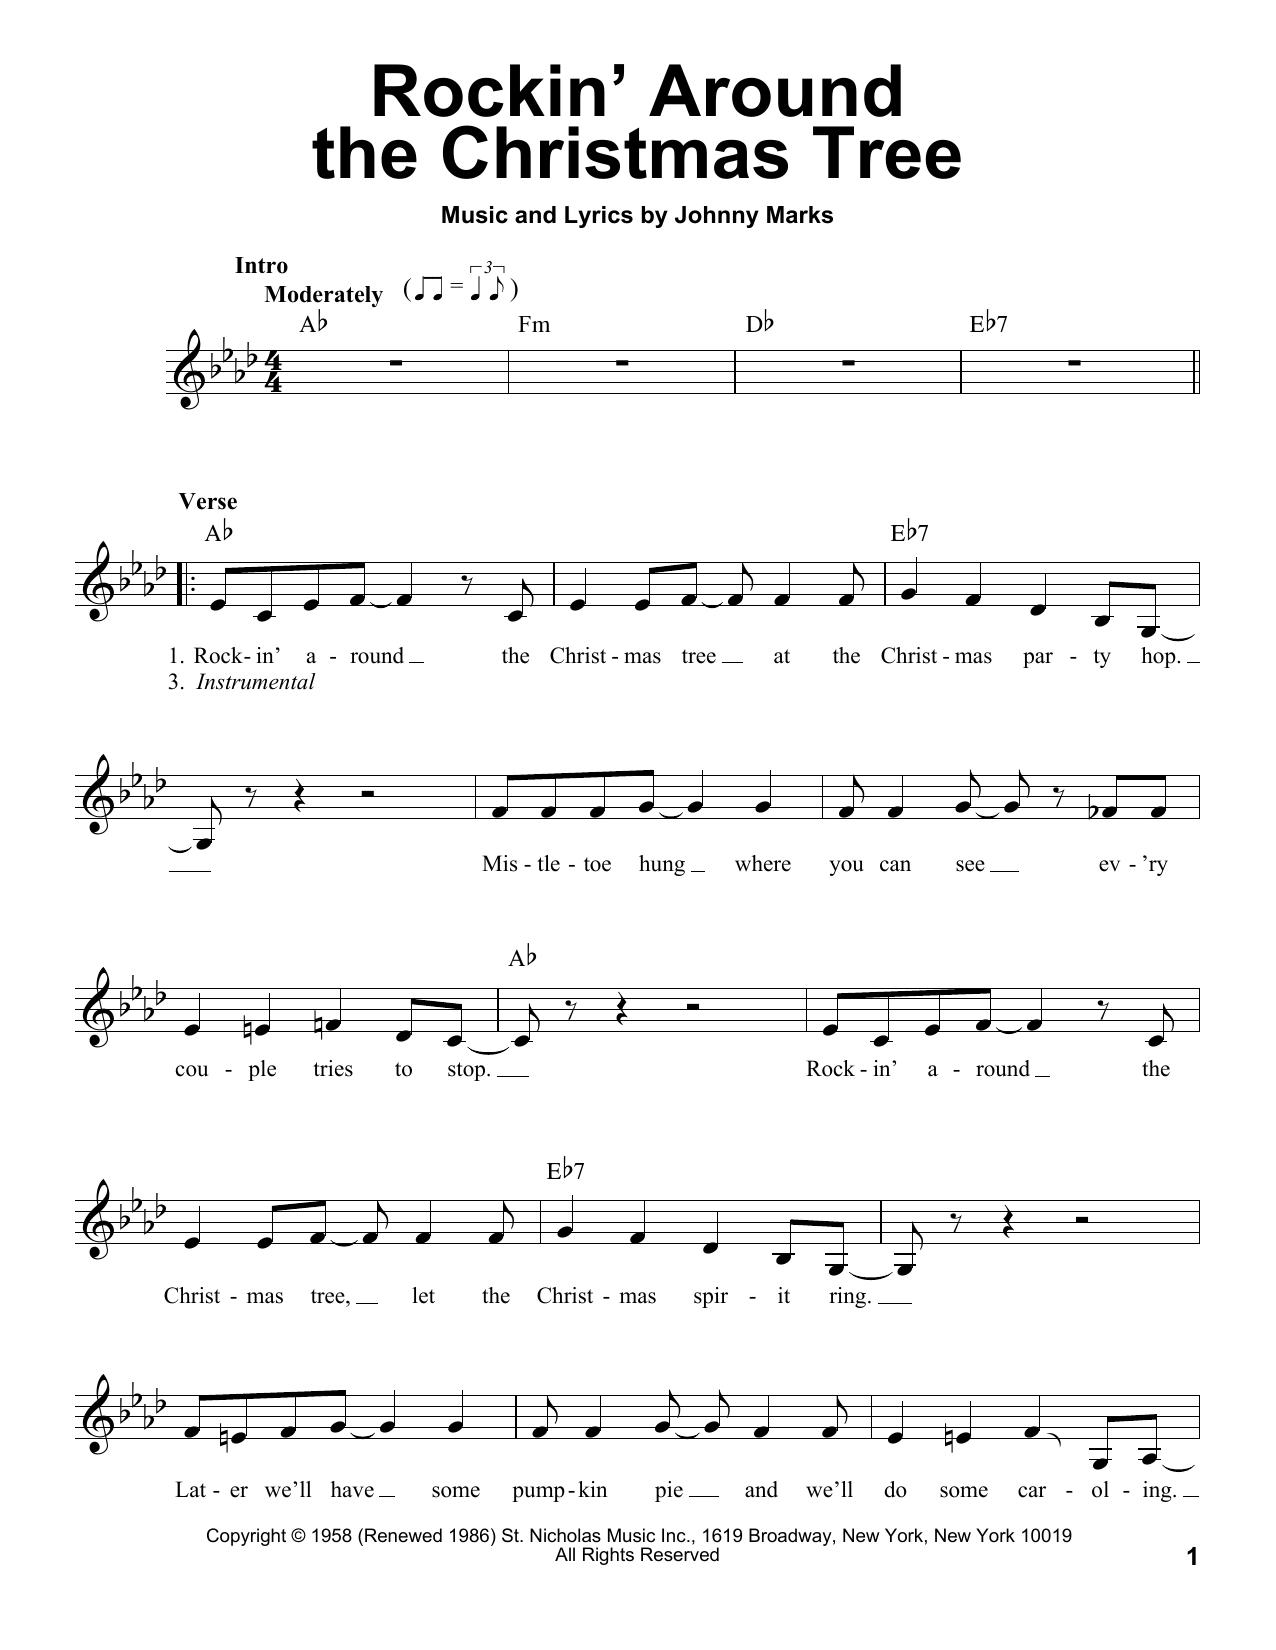 Rockin' Around The Christmas Tree Sheet Music | Johnny Marks | Pro Vocal